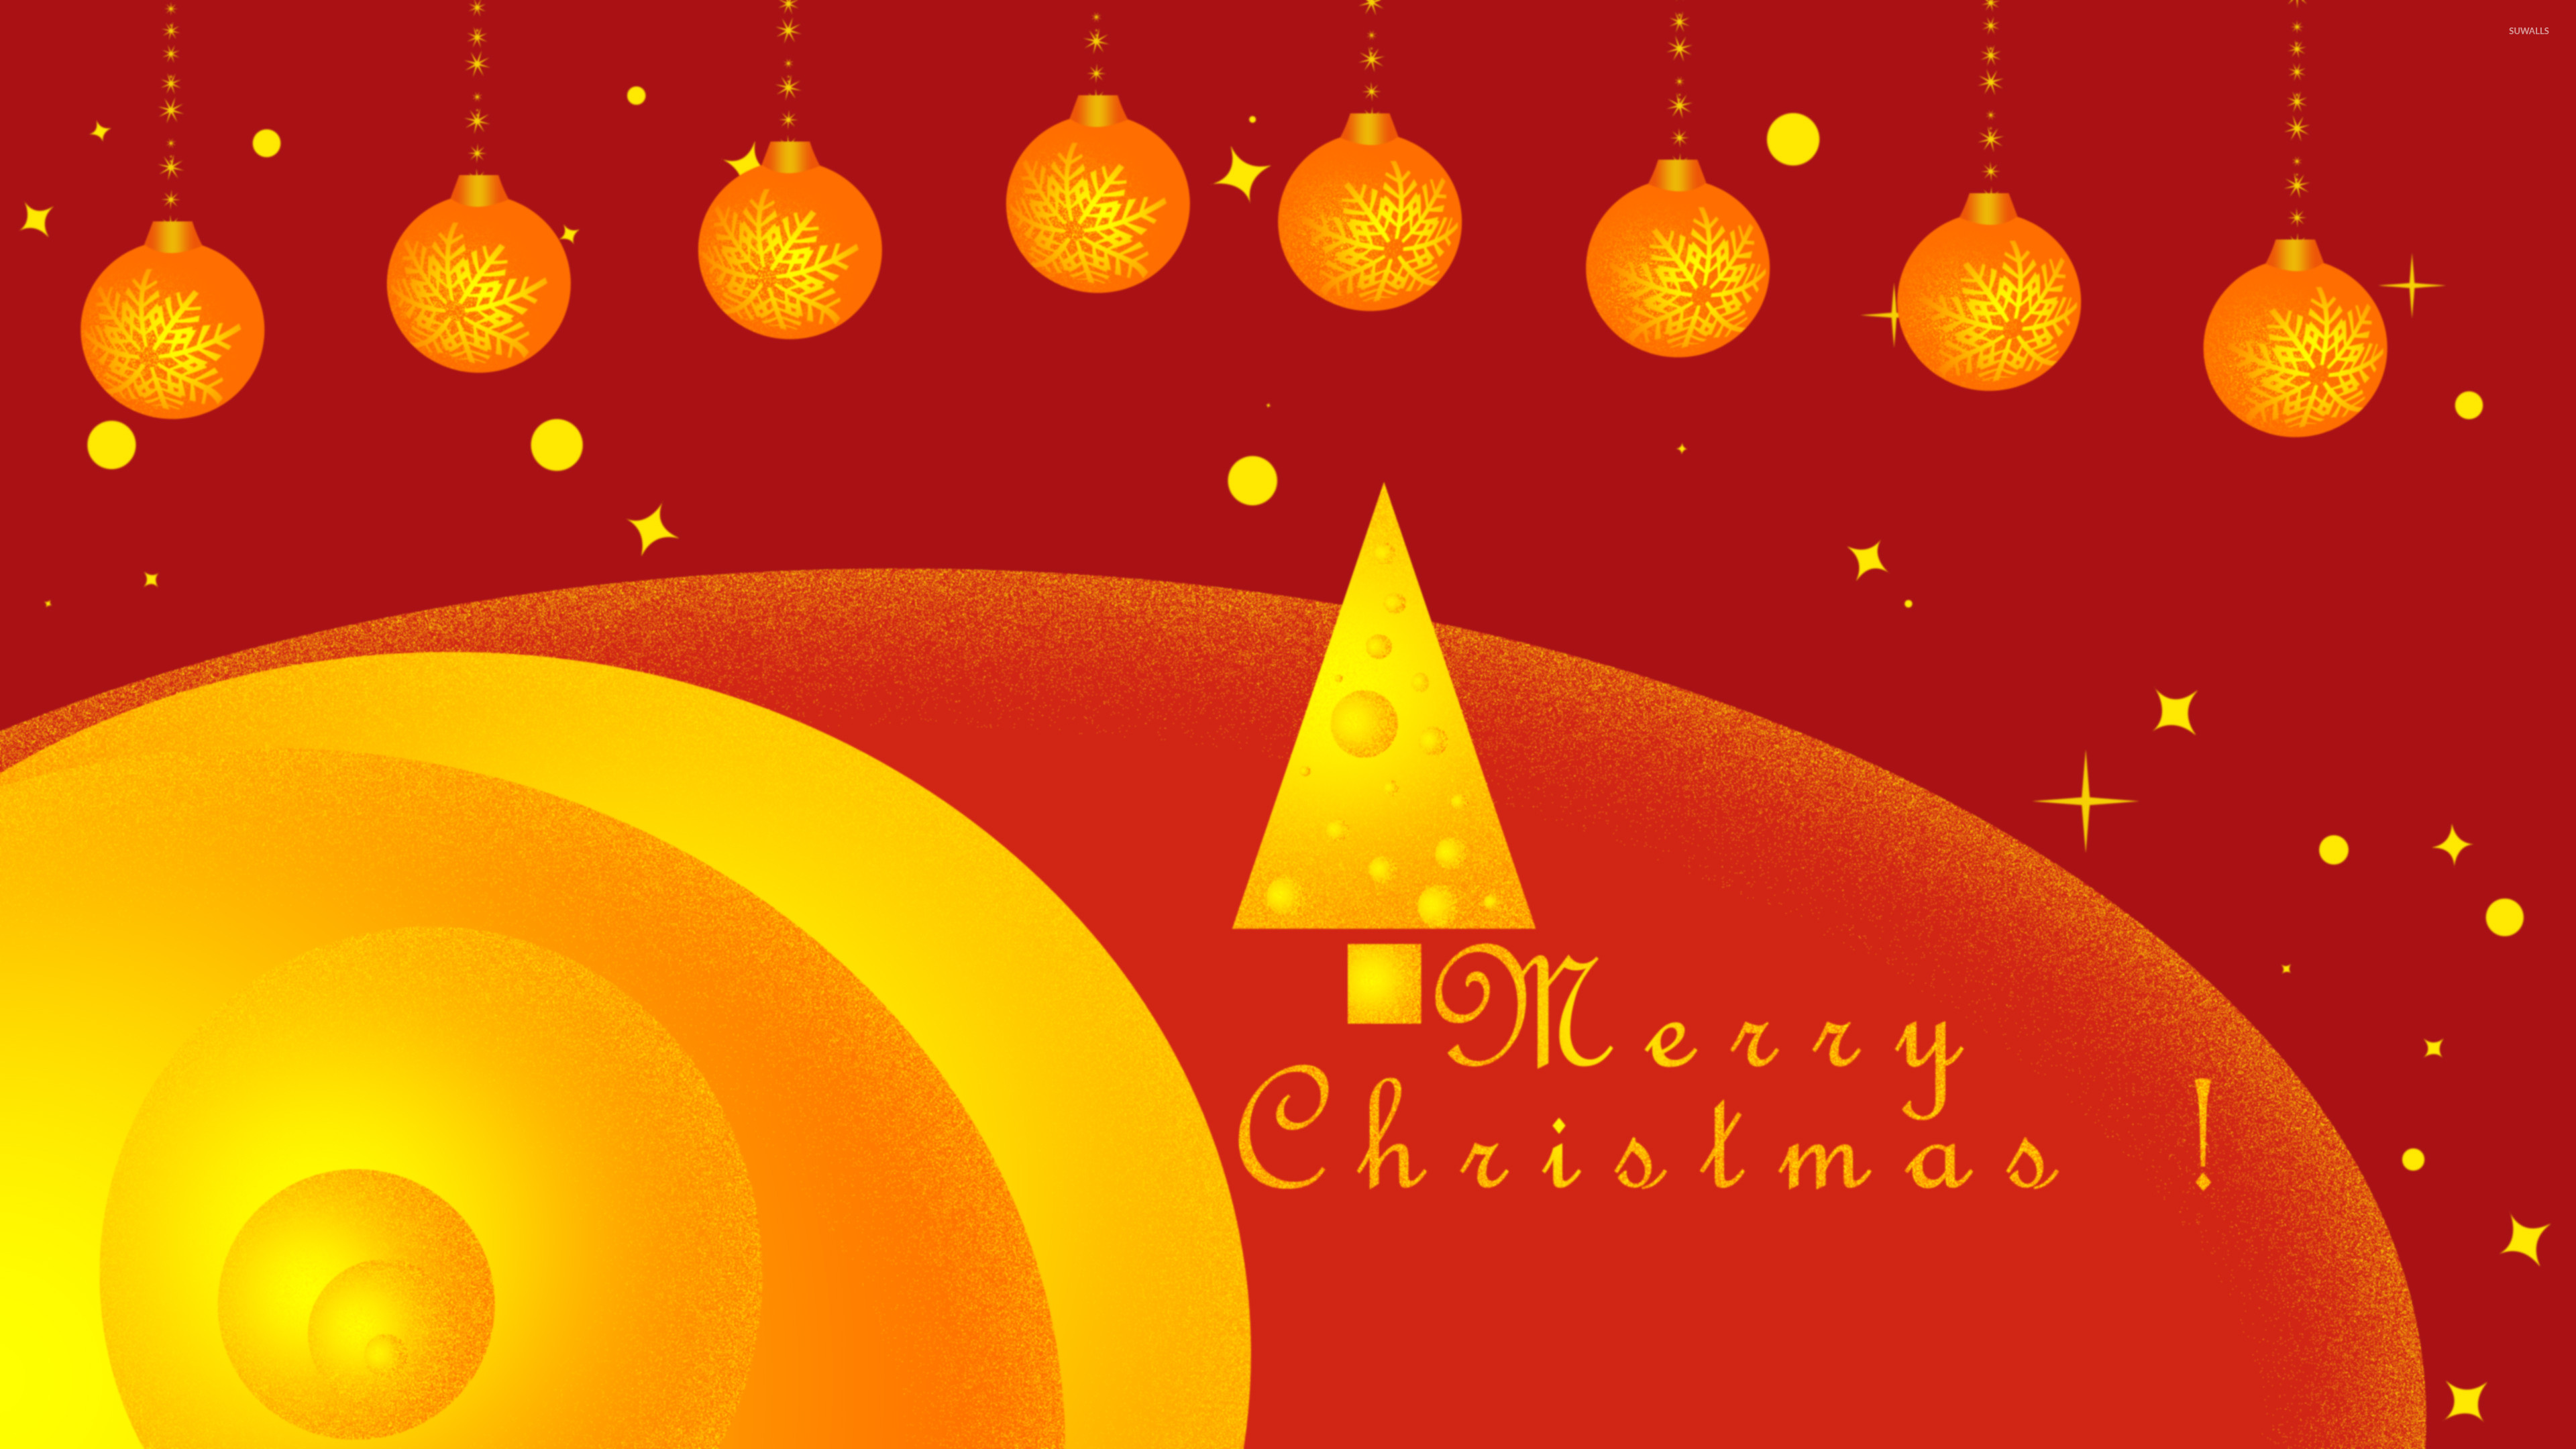 Golden Christmas tree and baubles wallpaper jpg